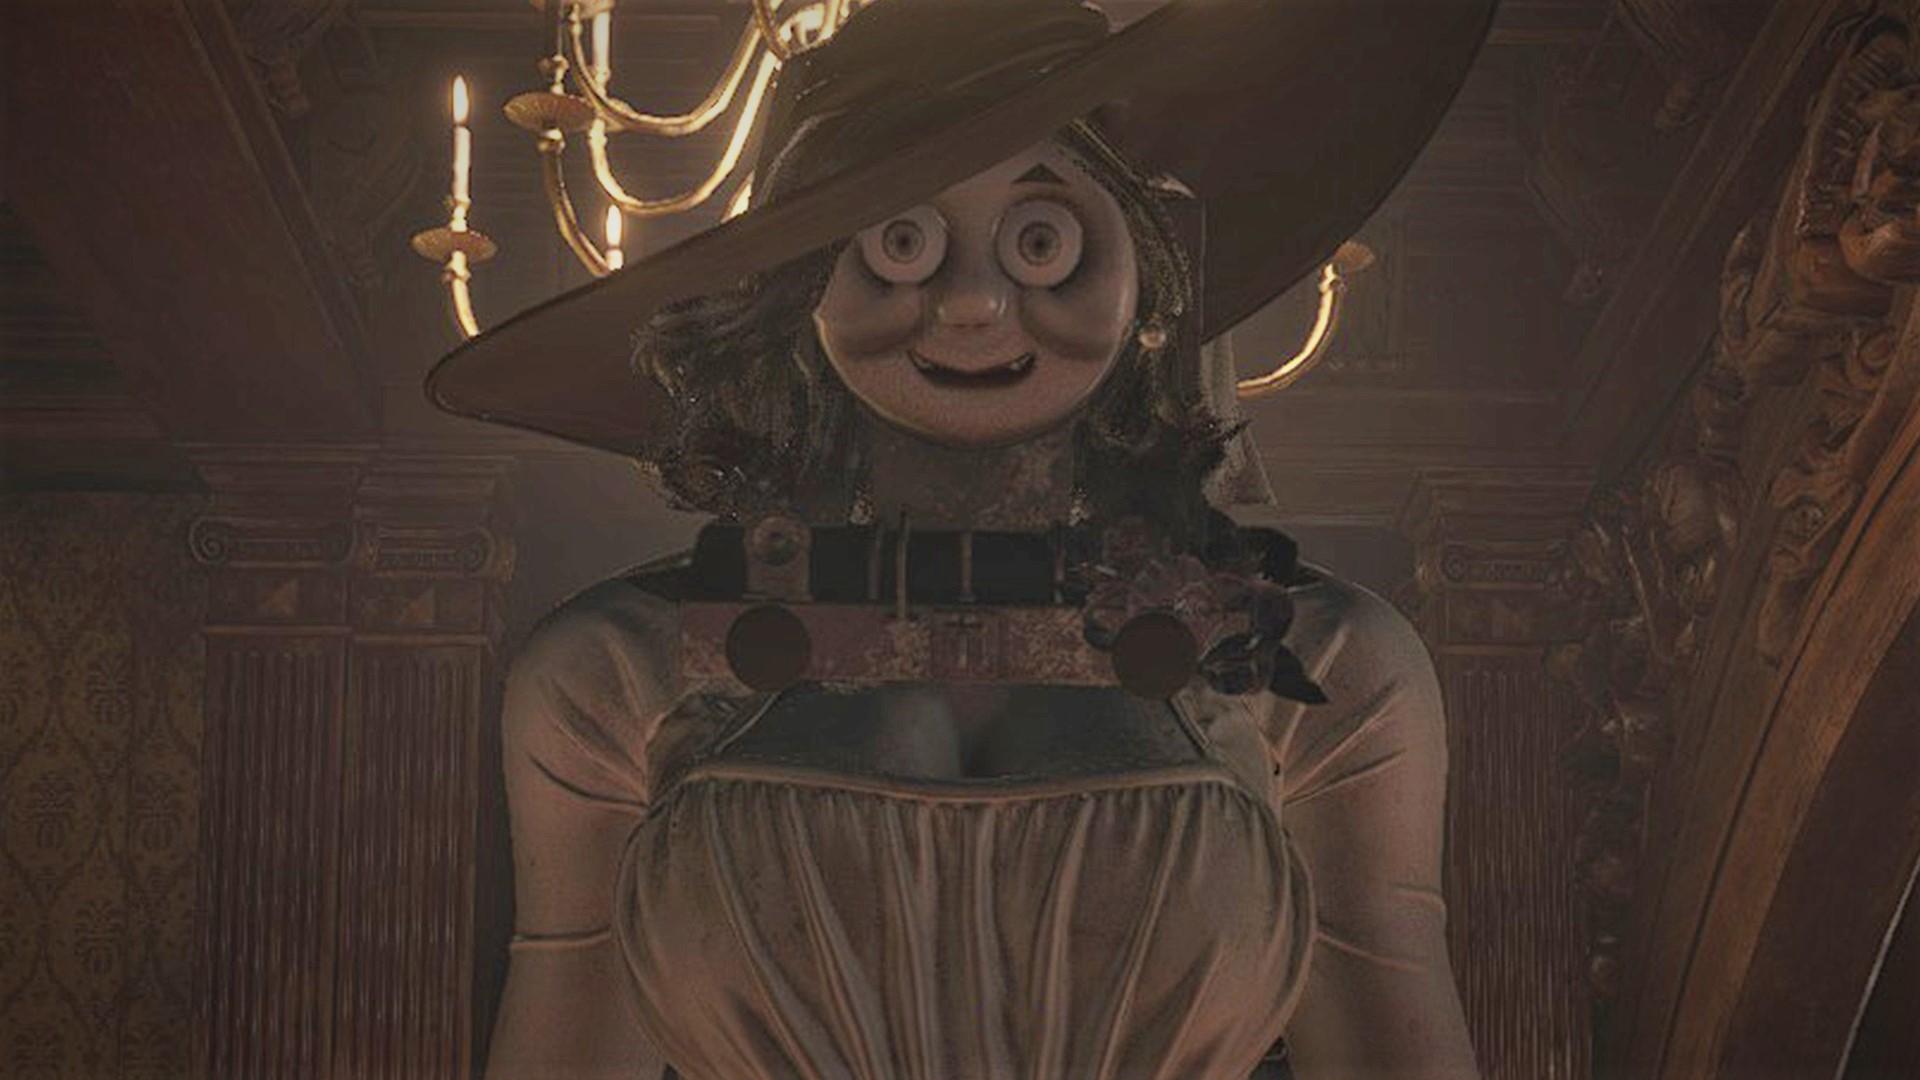 Horrific Resident Evil Village mod sees Thomas the Tank Engine return as Lady Dimitrescu screenshot